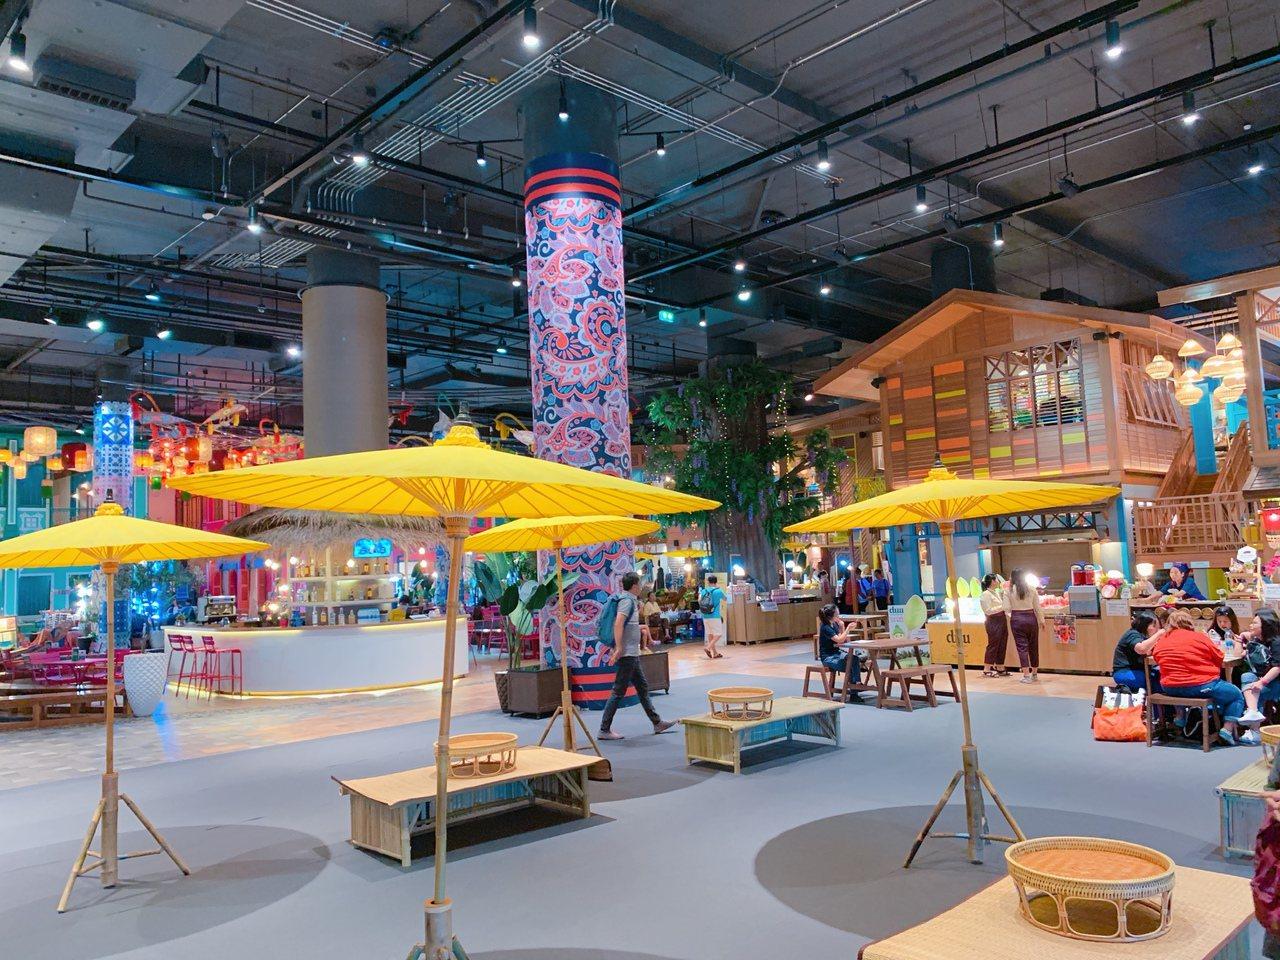 「SOOKSIAM」匯聚全國美食、藝術和文化商店,多樣化選擇一次滿足。記者徐力剛...